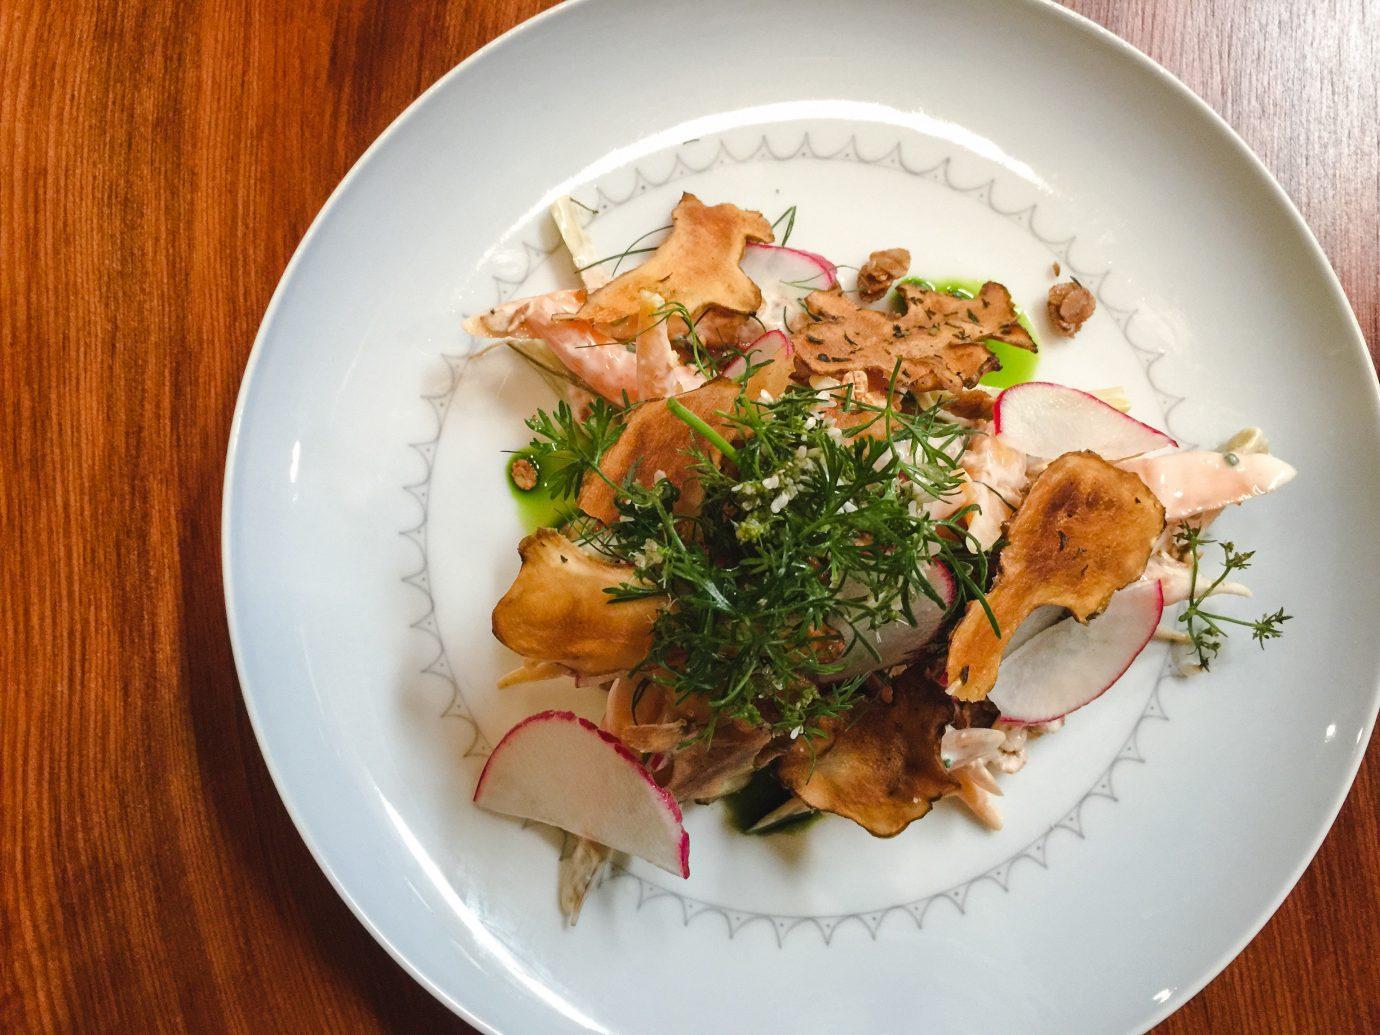 Trip Ideas plate food table dish cuisine white vegetarian food recipe thai food asian food Seafood meal meat vegetable piece de resistance